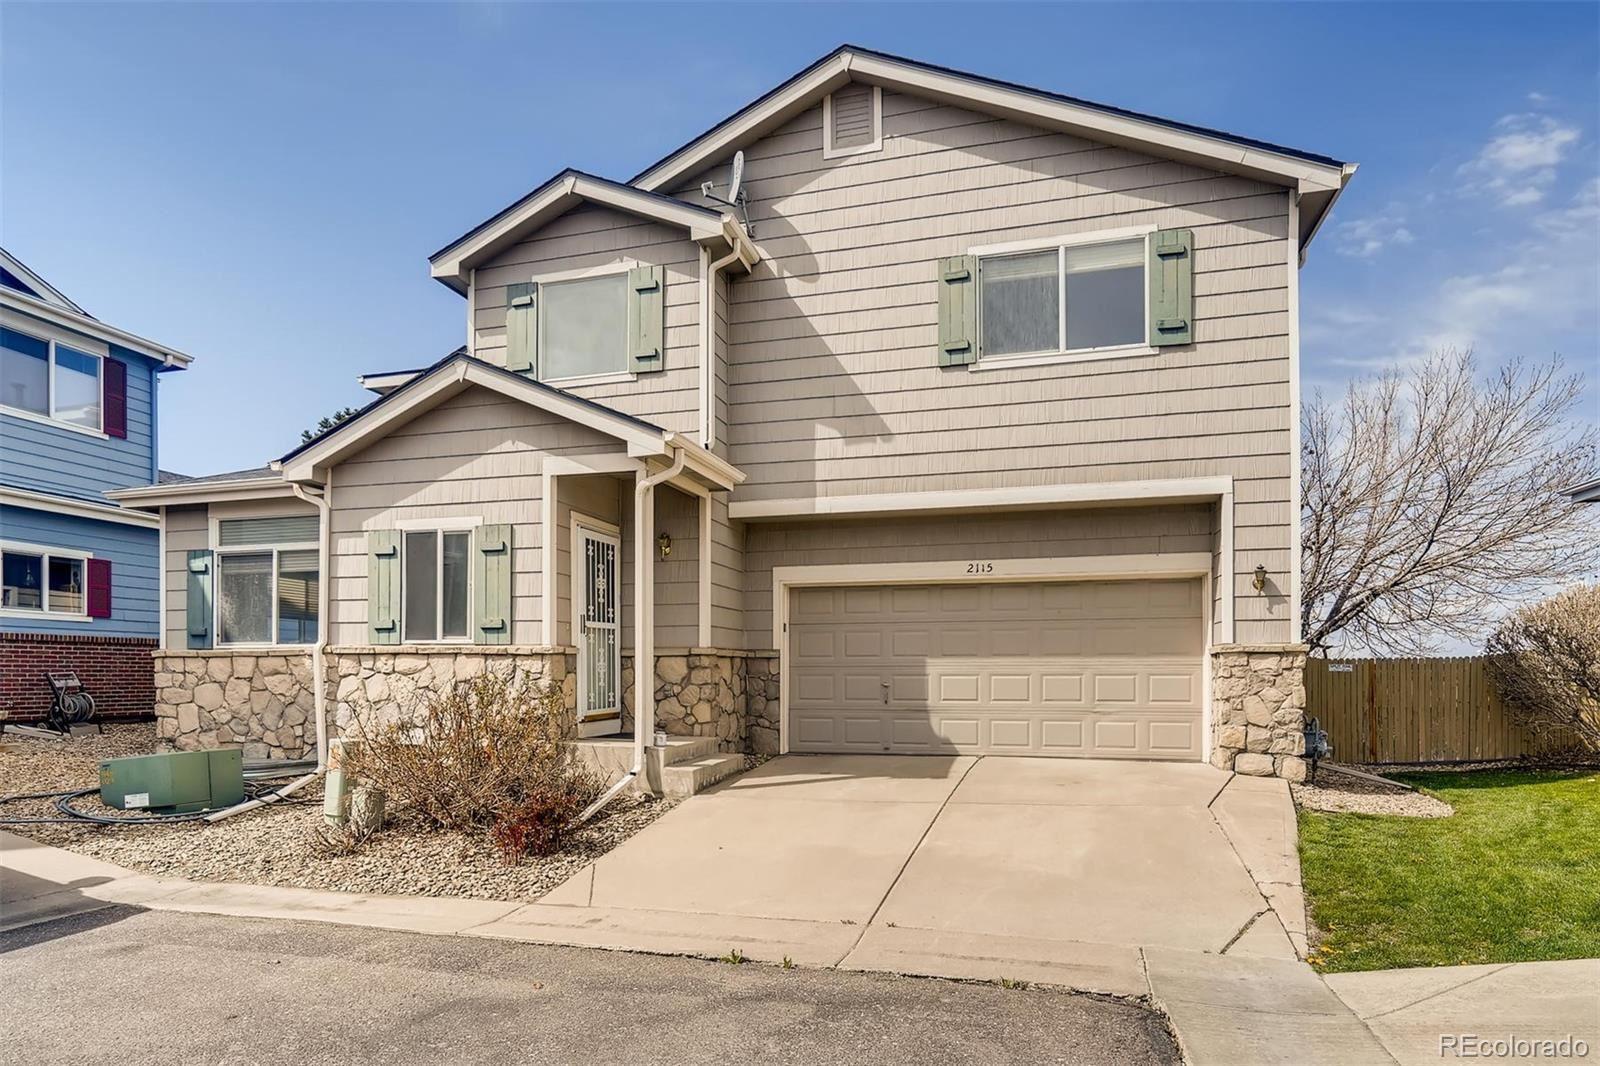 2115 W 101st Circle, Thornton, CO 80260 - #: 3052001